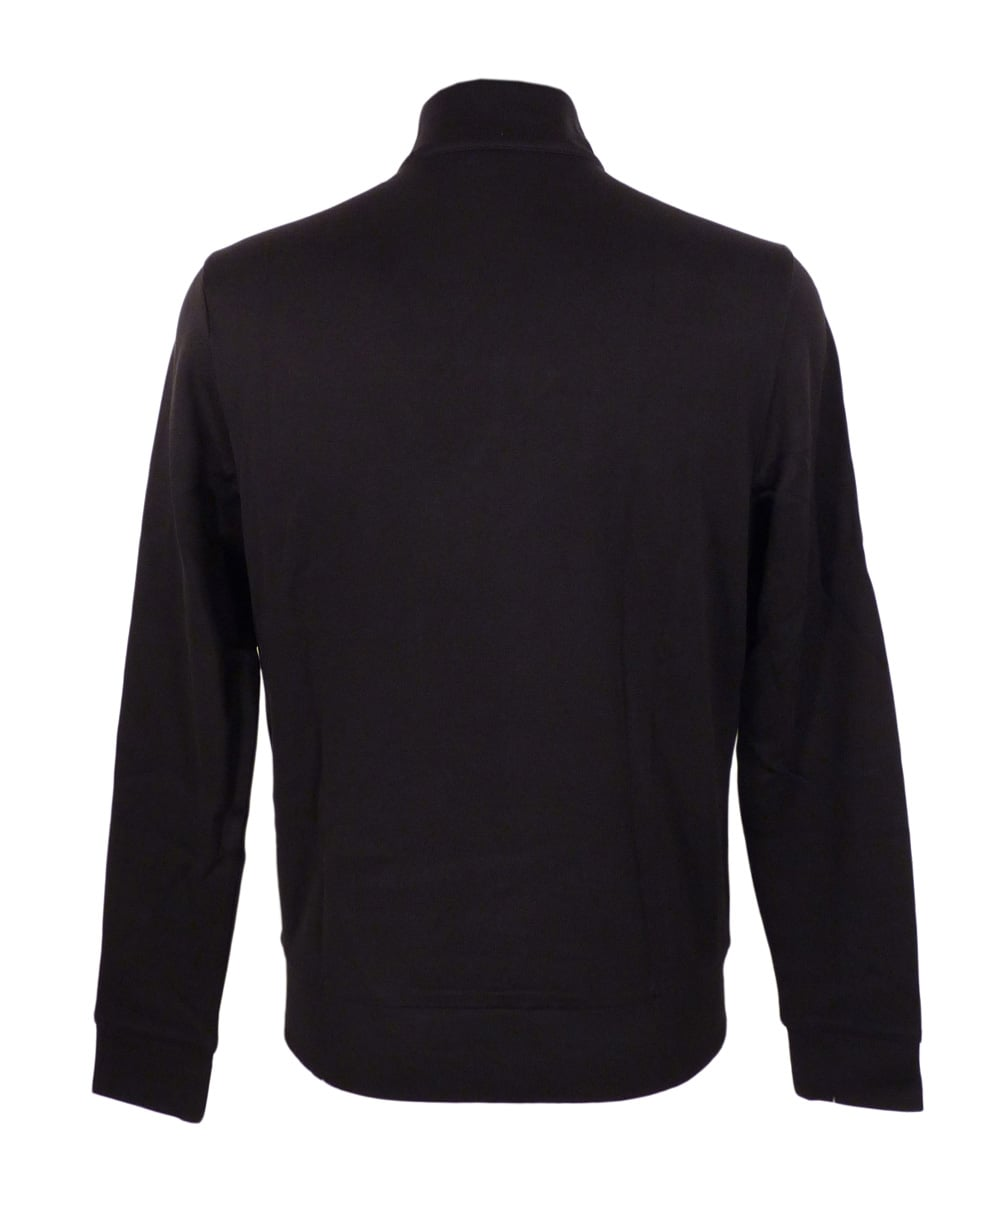 hugo boss black 39 sidney 02 39 cotton sweatshirt hugo boss. Black Bedroom Furniture Sets. Home Design Ideas